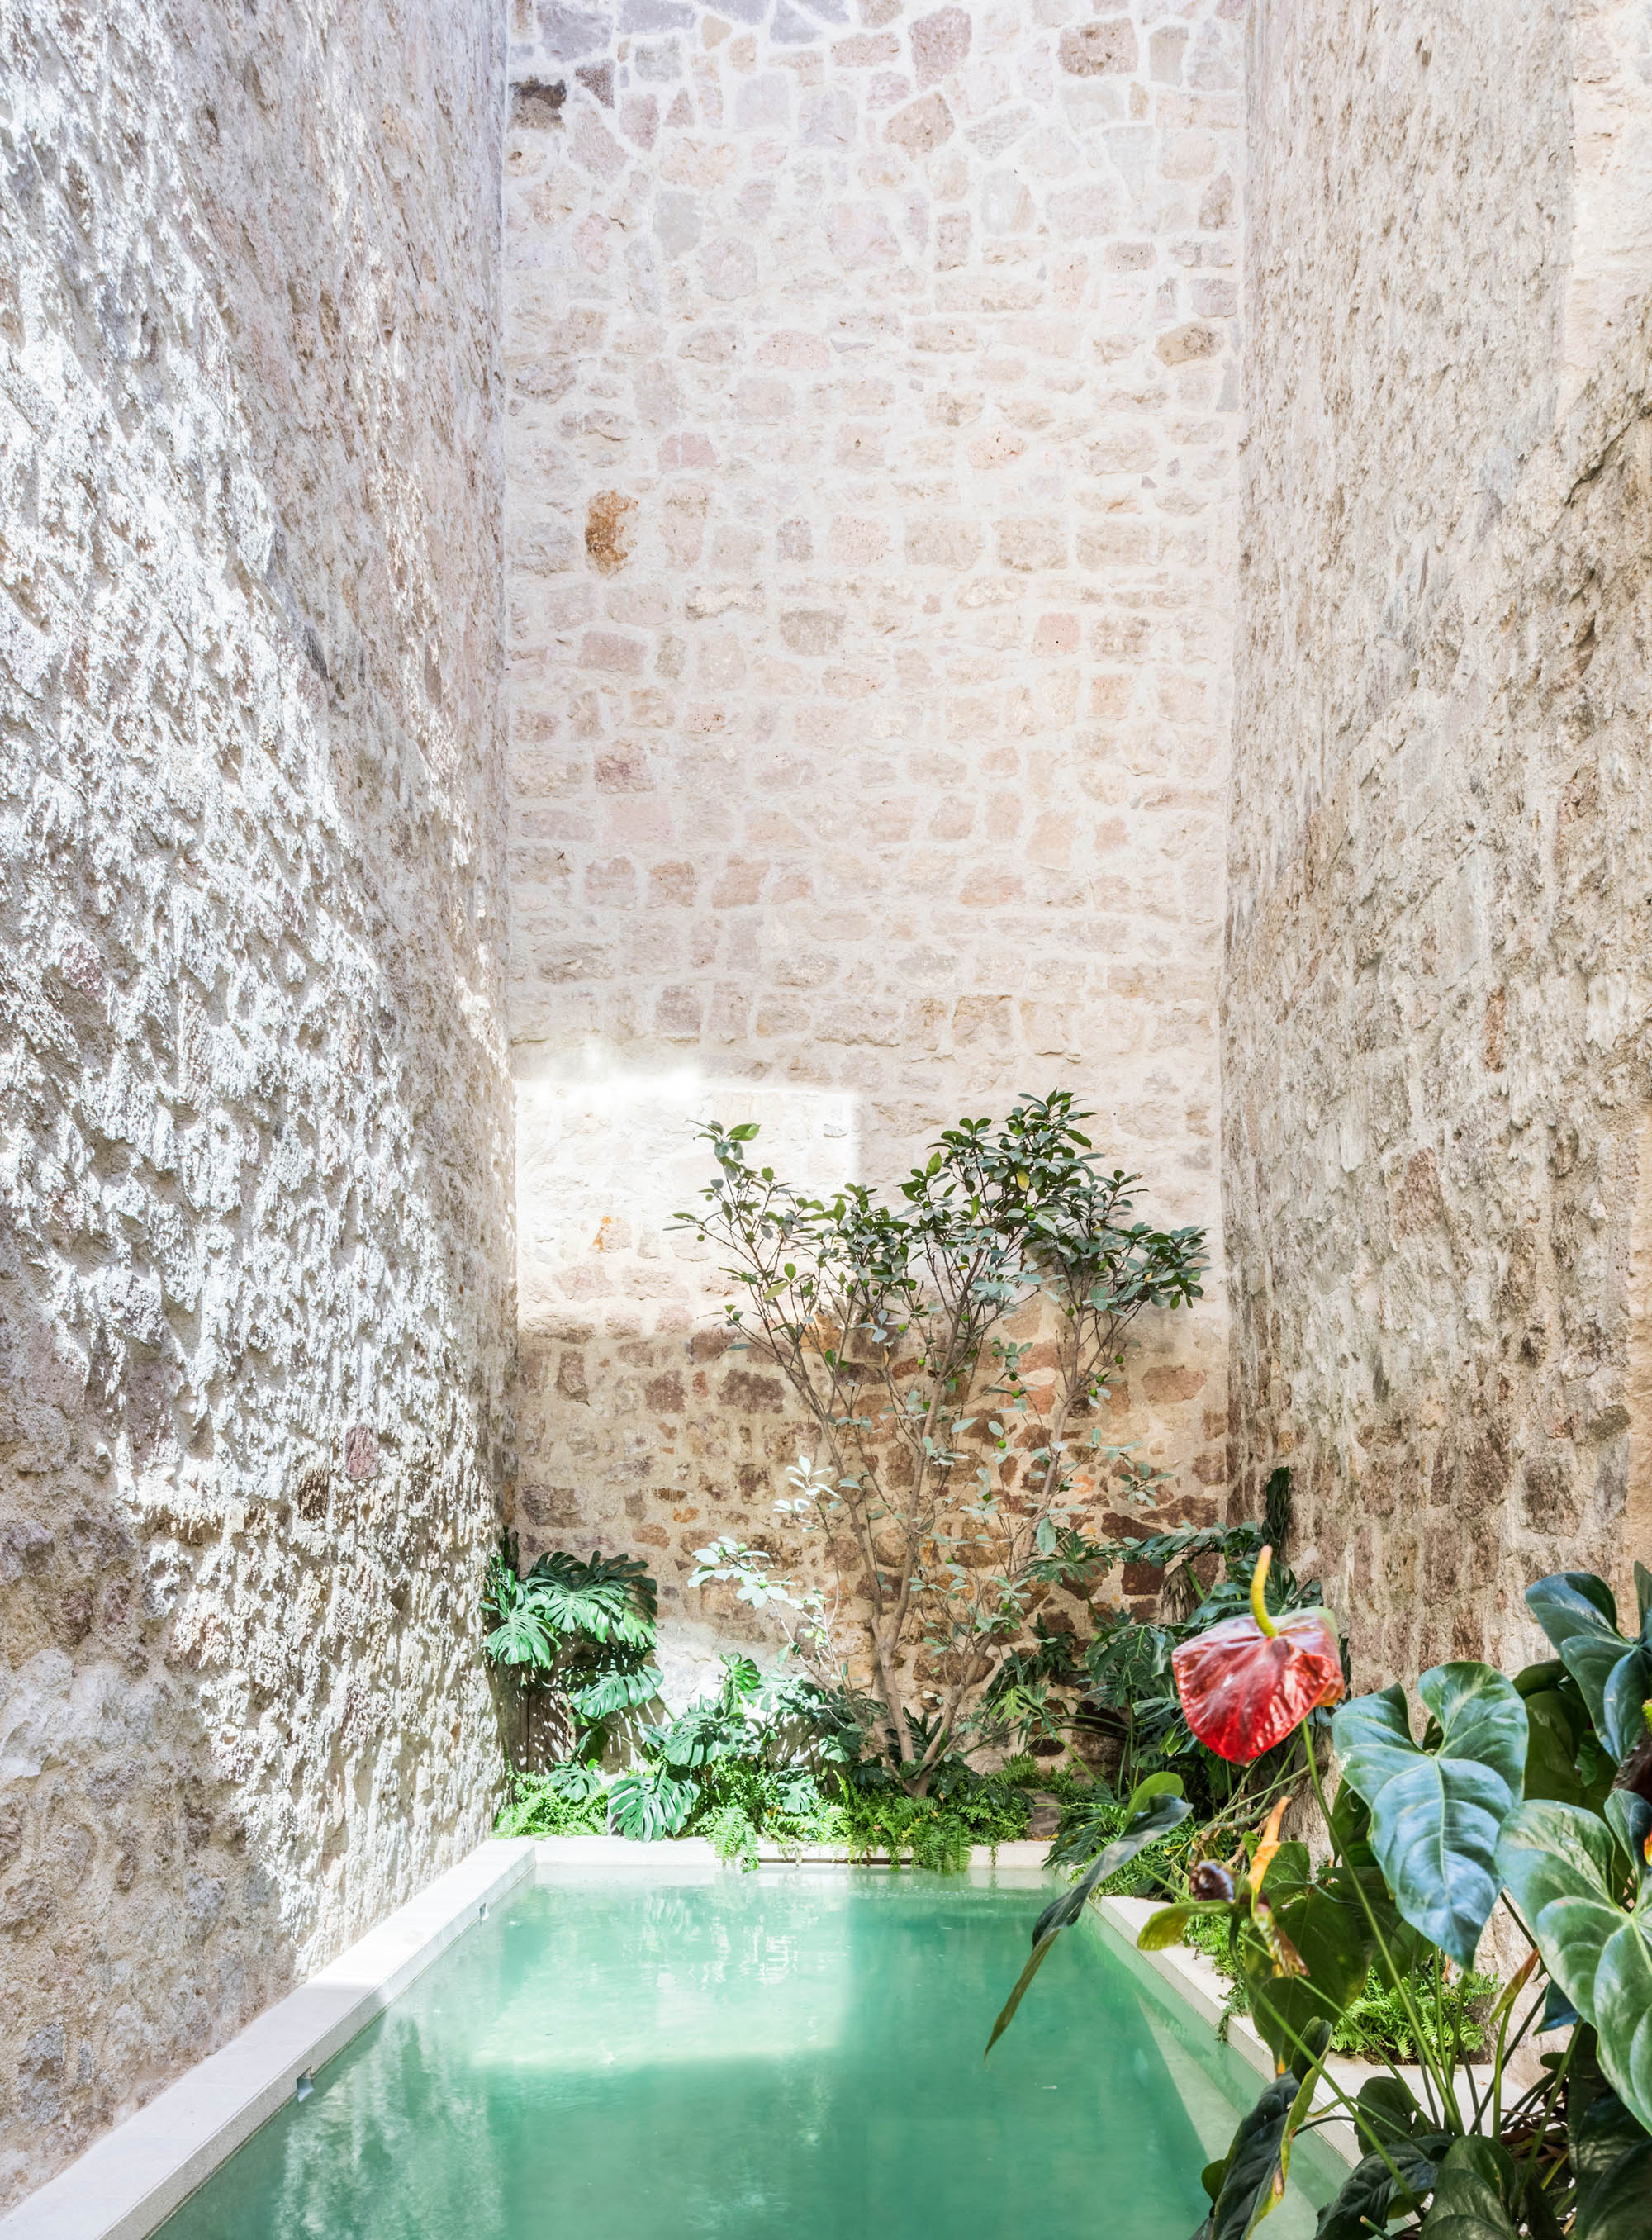 luis_laplace-Casa_Michelena_Morelia-6